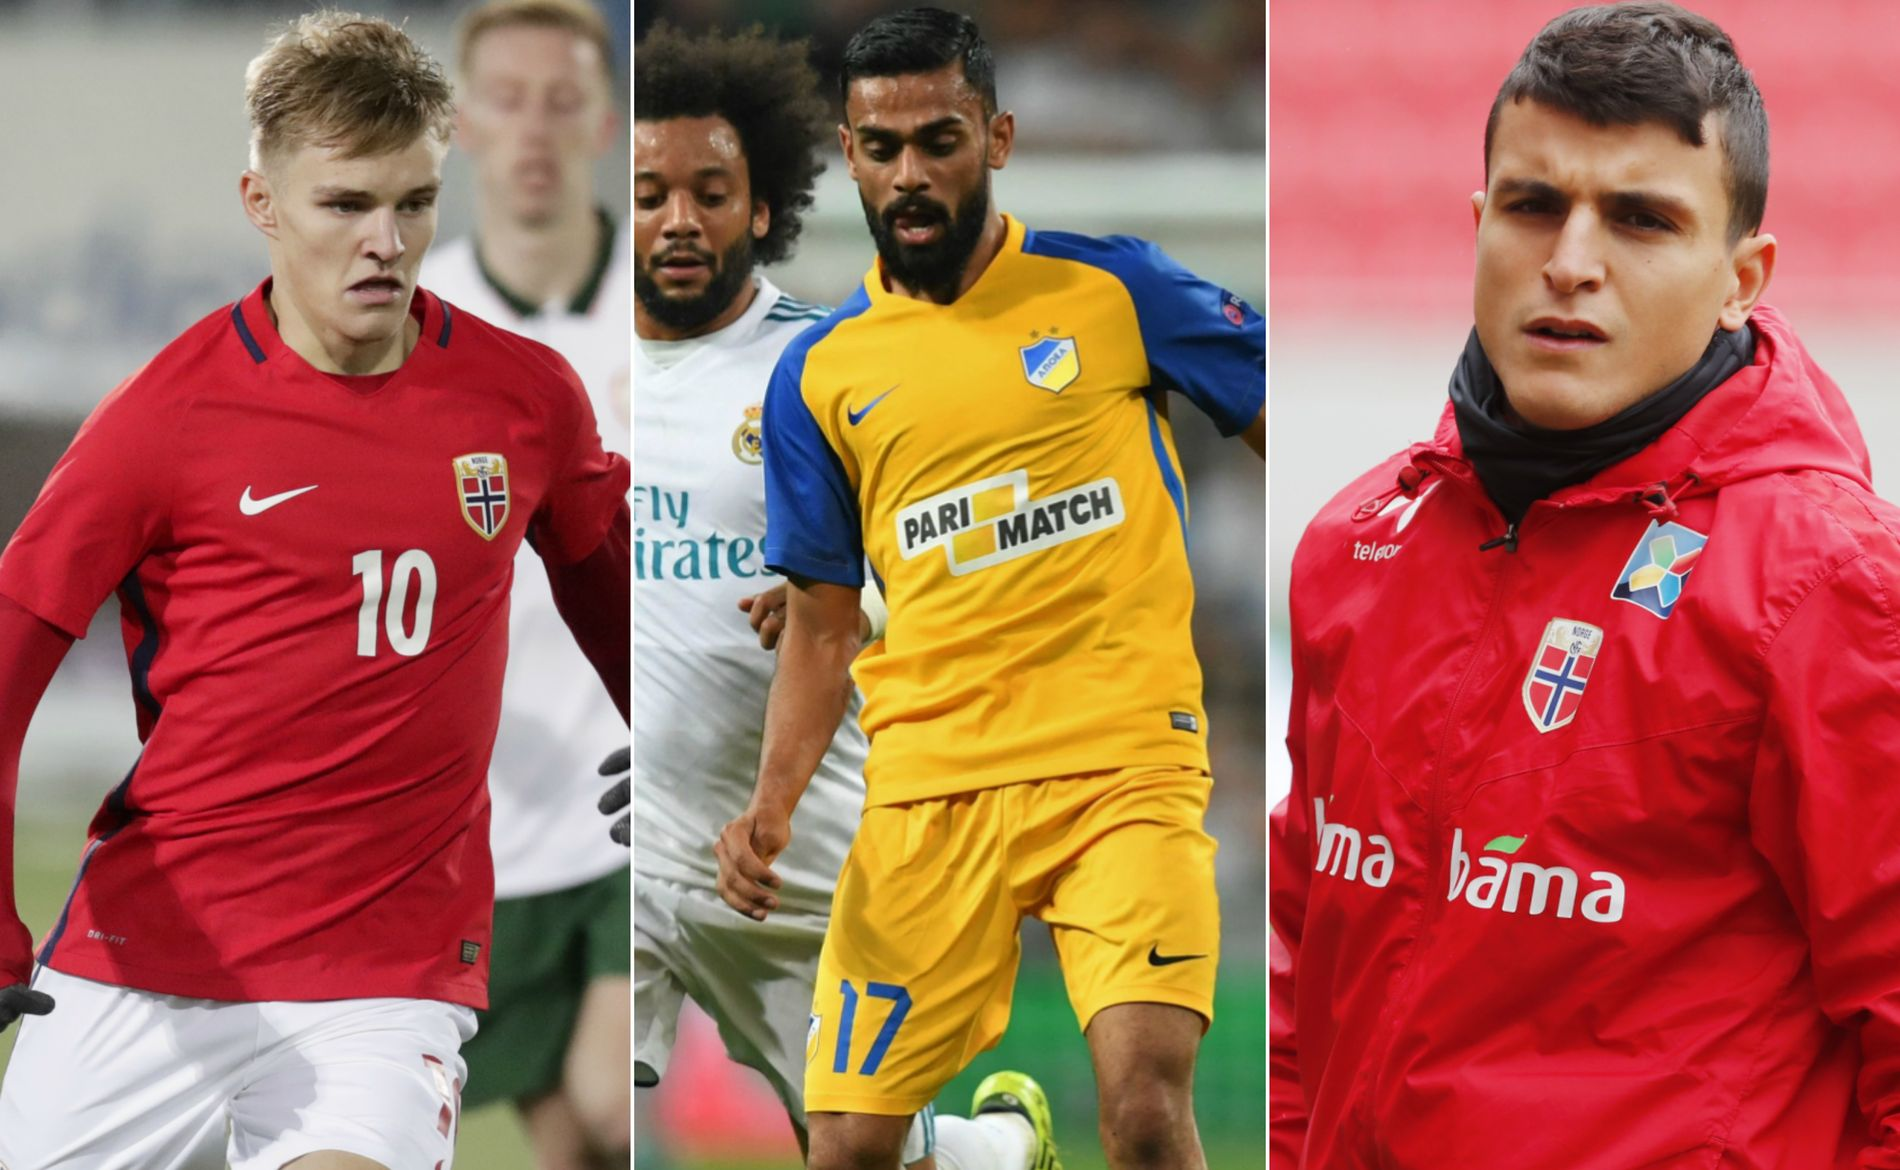 HERJET: Martin Ødegaard (f.v.), Ghayas Zahid og Moi Elyounoussi briljerte for sine klubblag denne helgen.